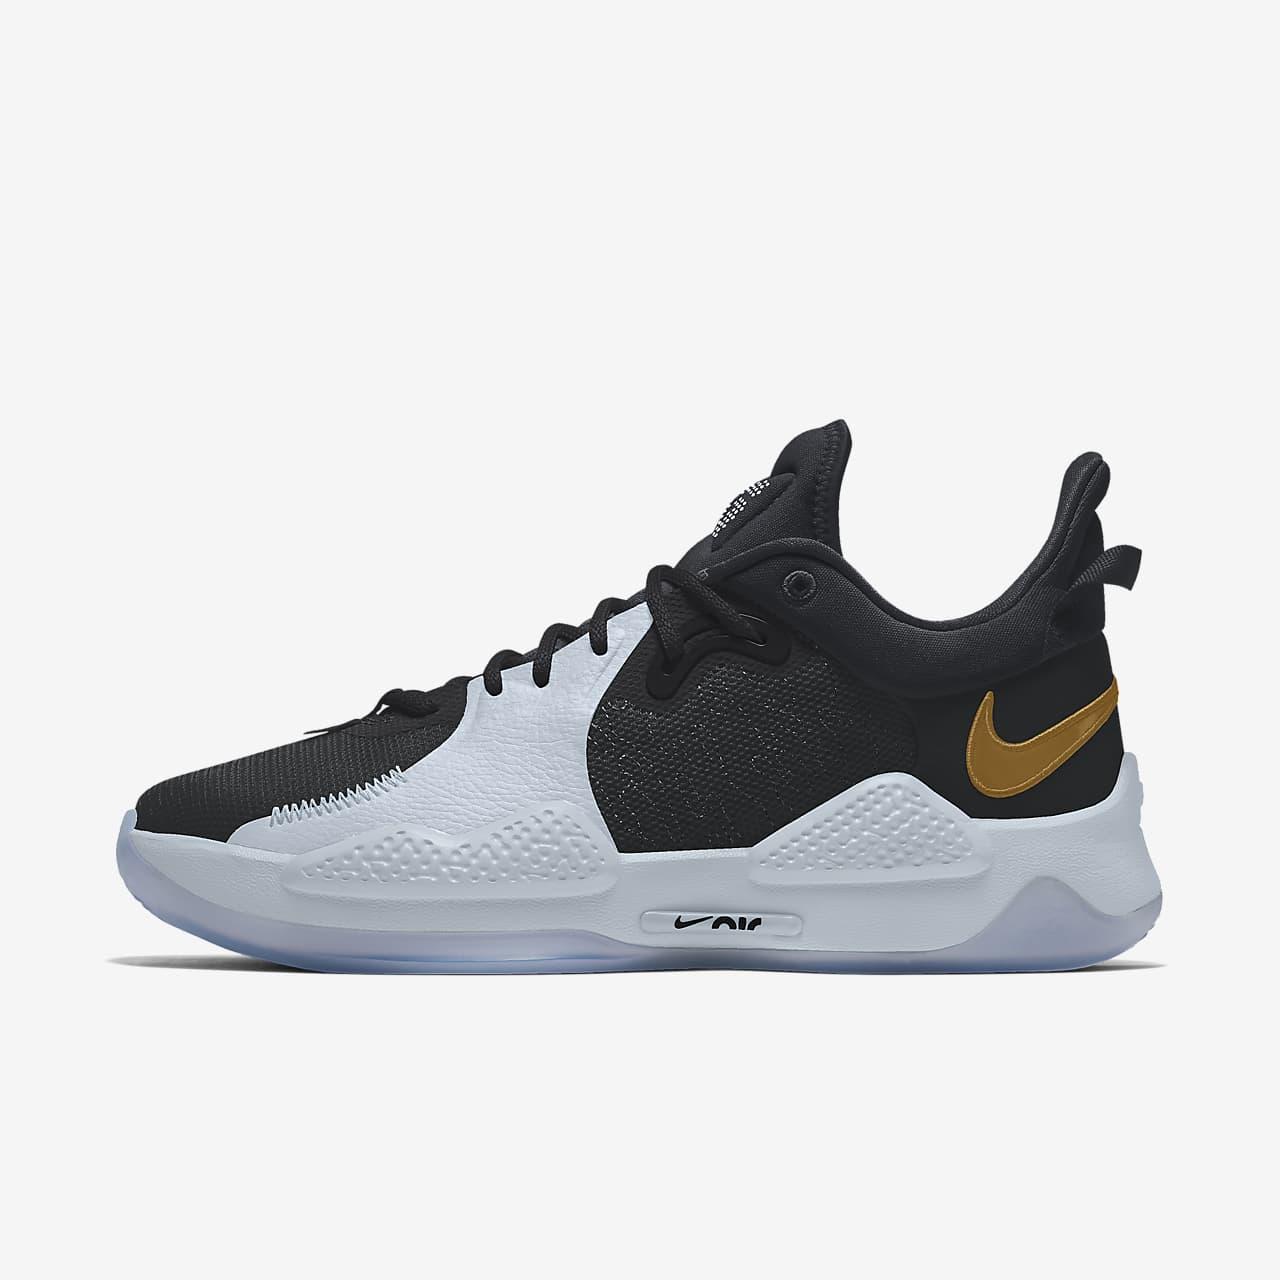 PG 5 By You Custom Basketball Shoe